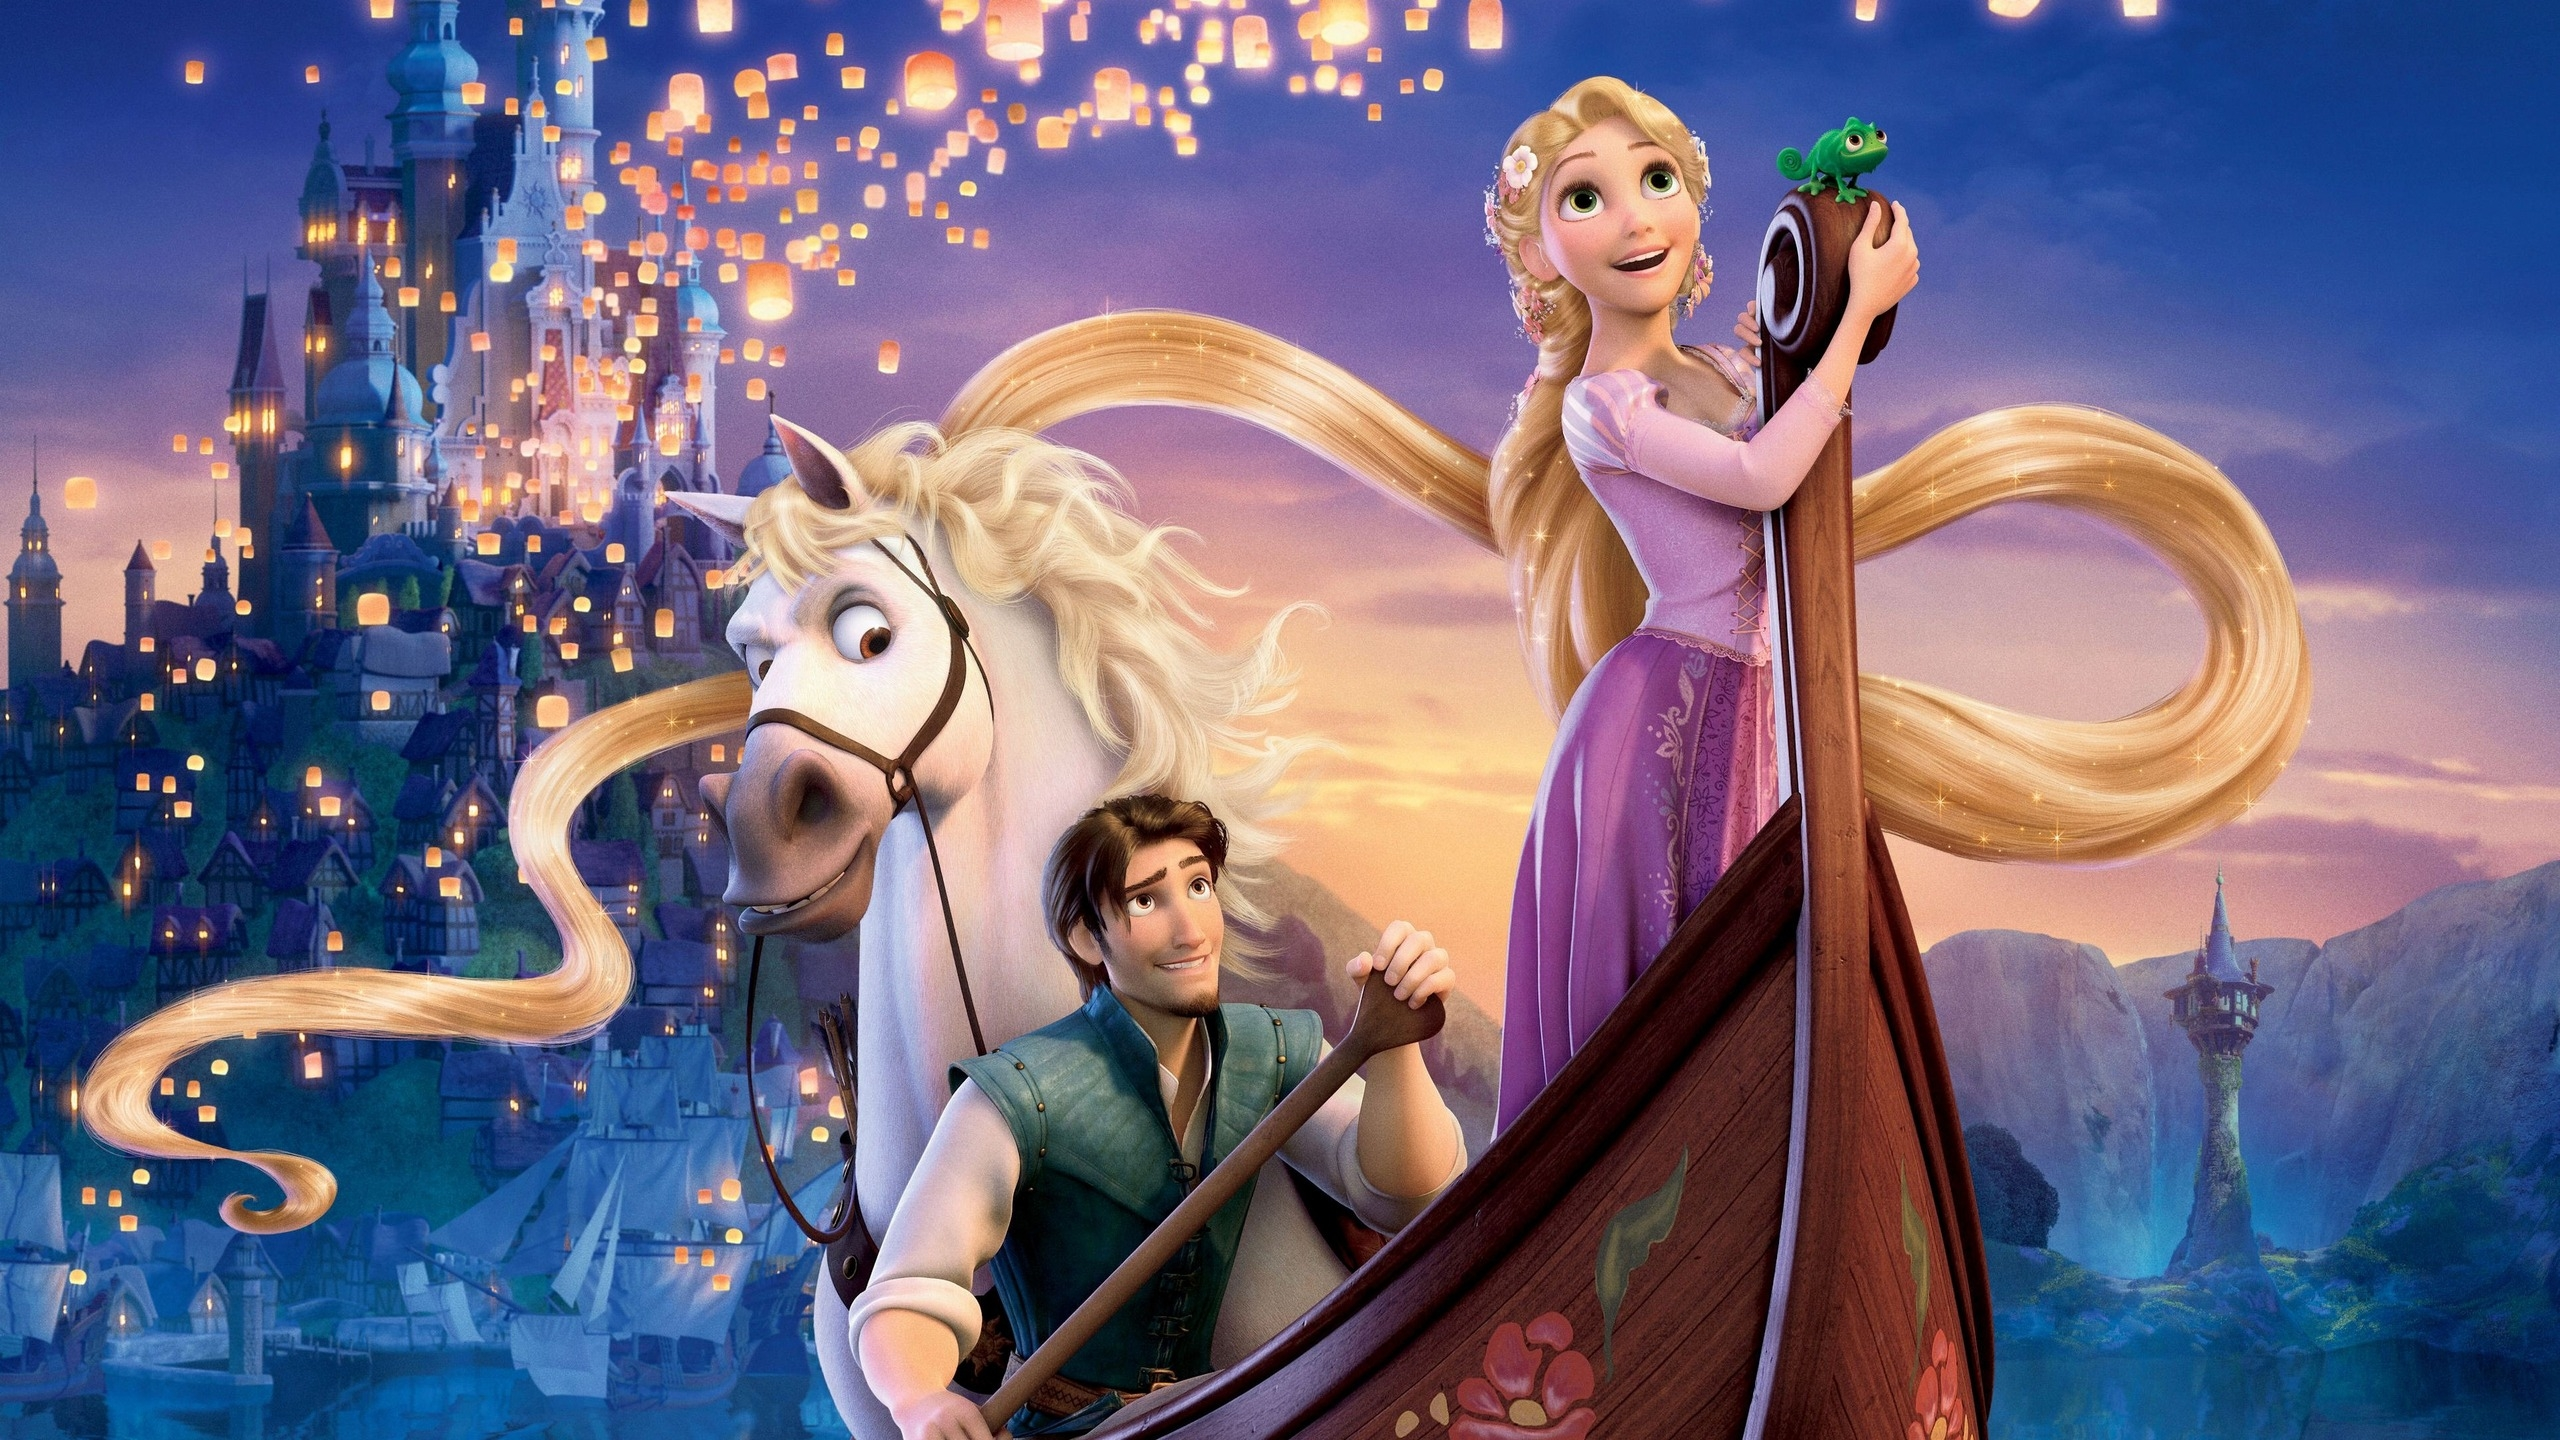 Disney Princess Wallpaper Desktop 2560×1440 #25594 HD Wallpaper Res ...